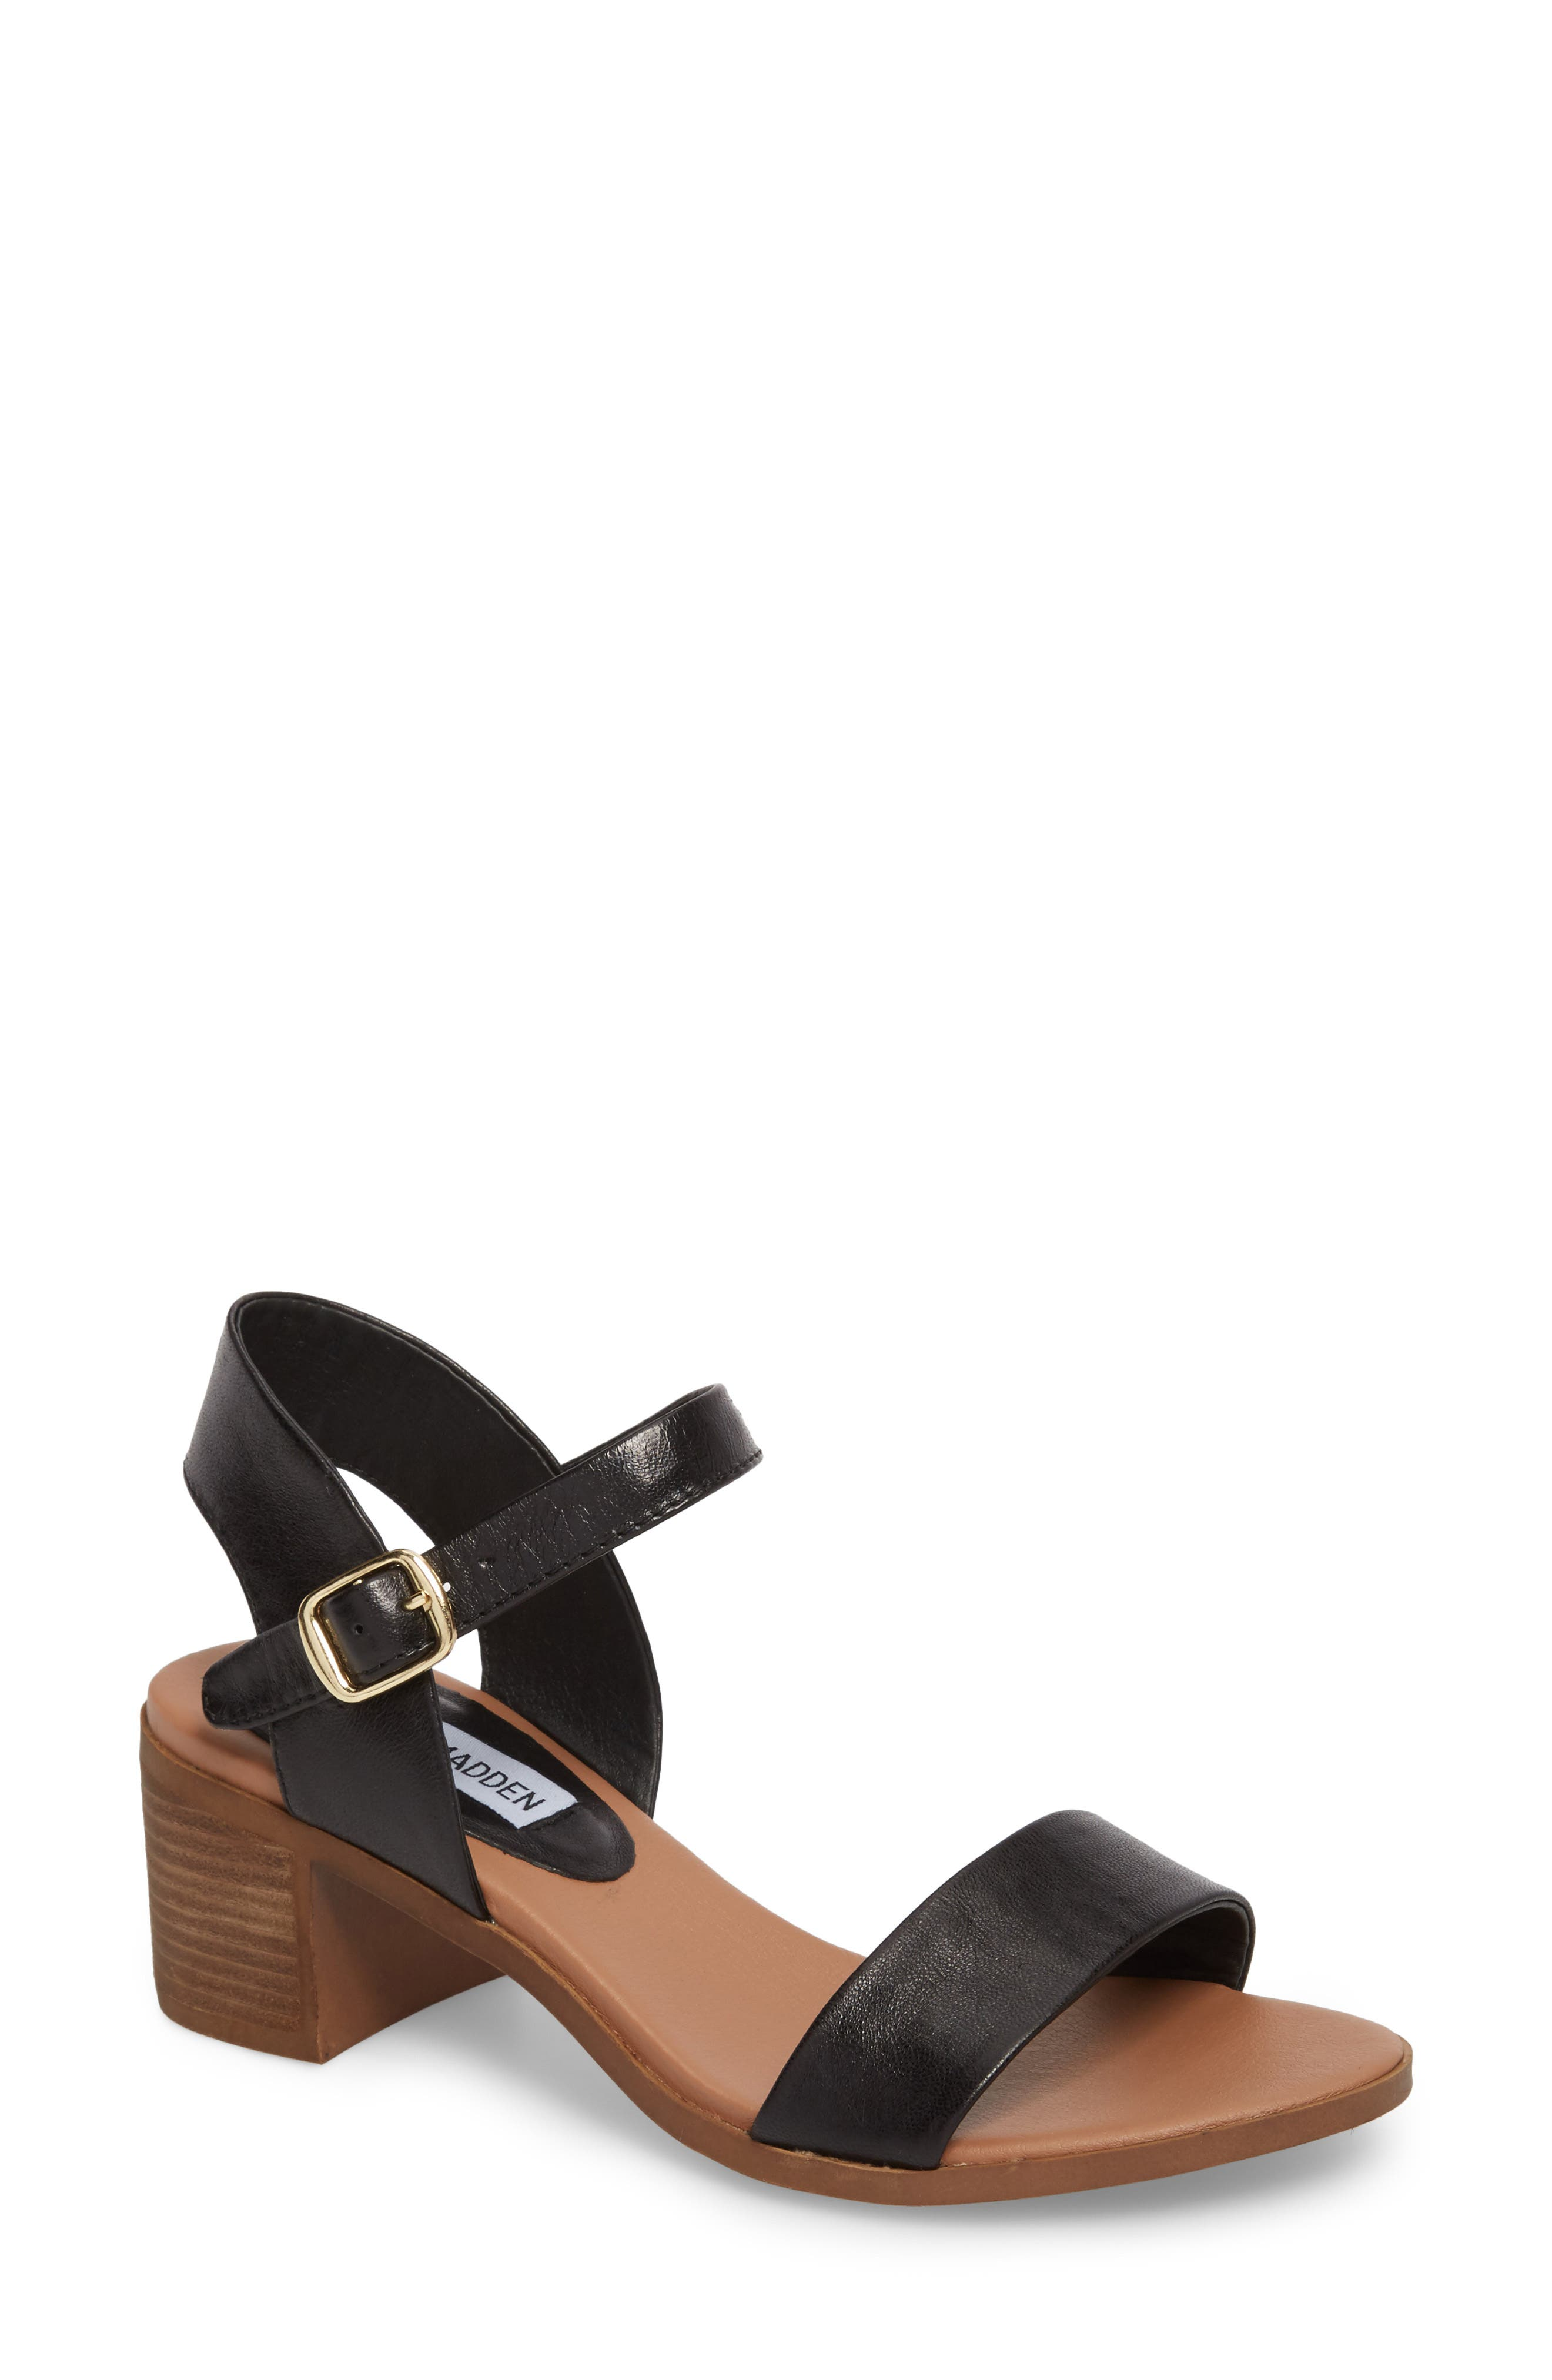 April Block Heel Sandal,                         Main,                         color, BLACK LEATHER